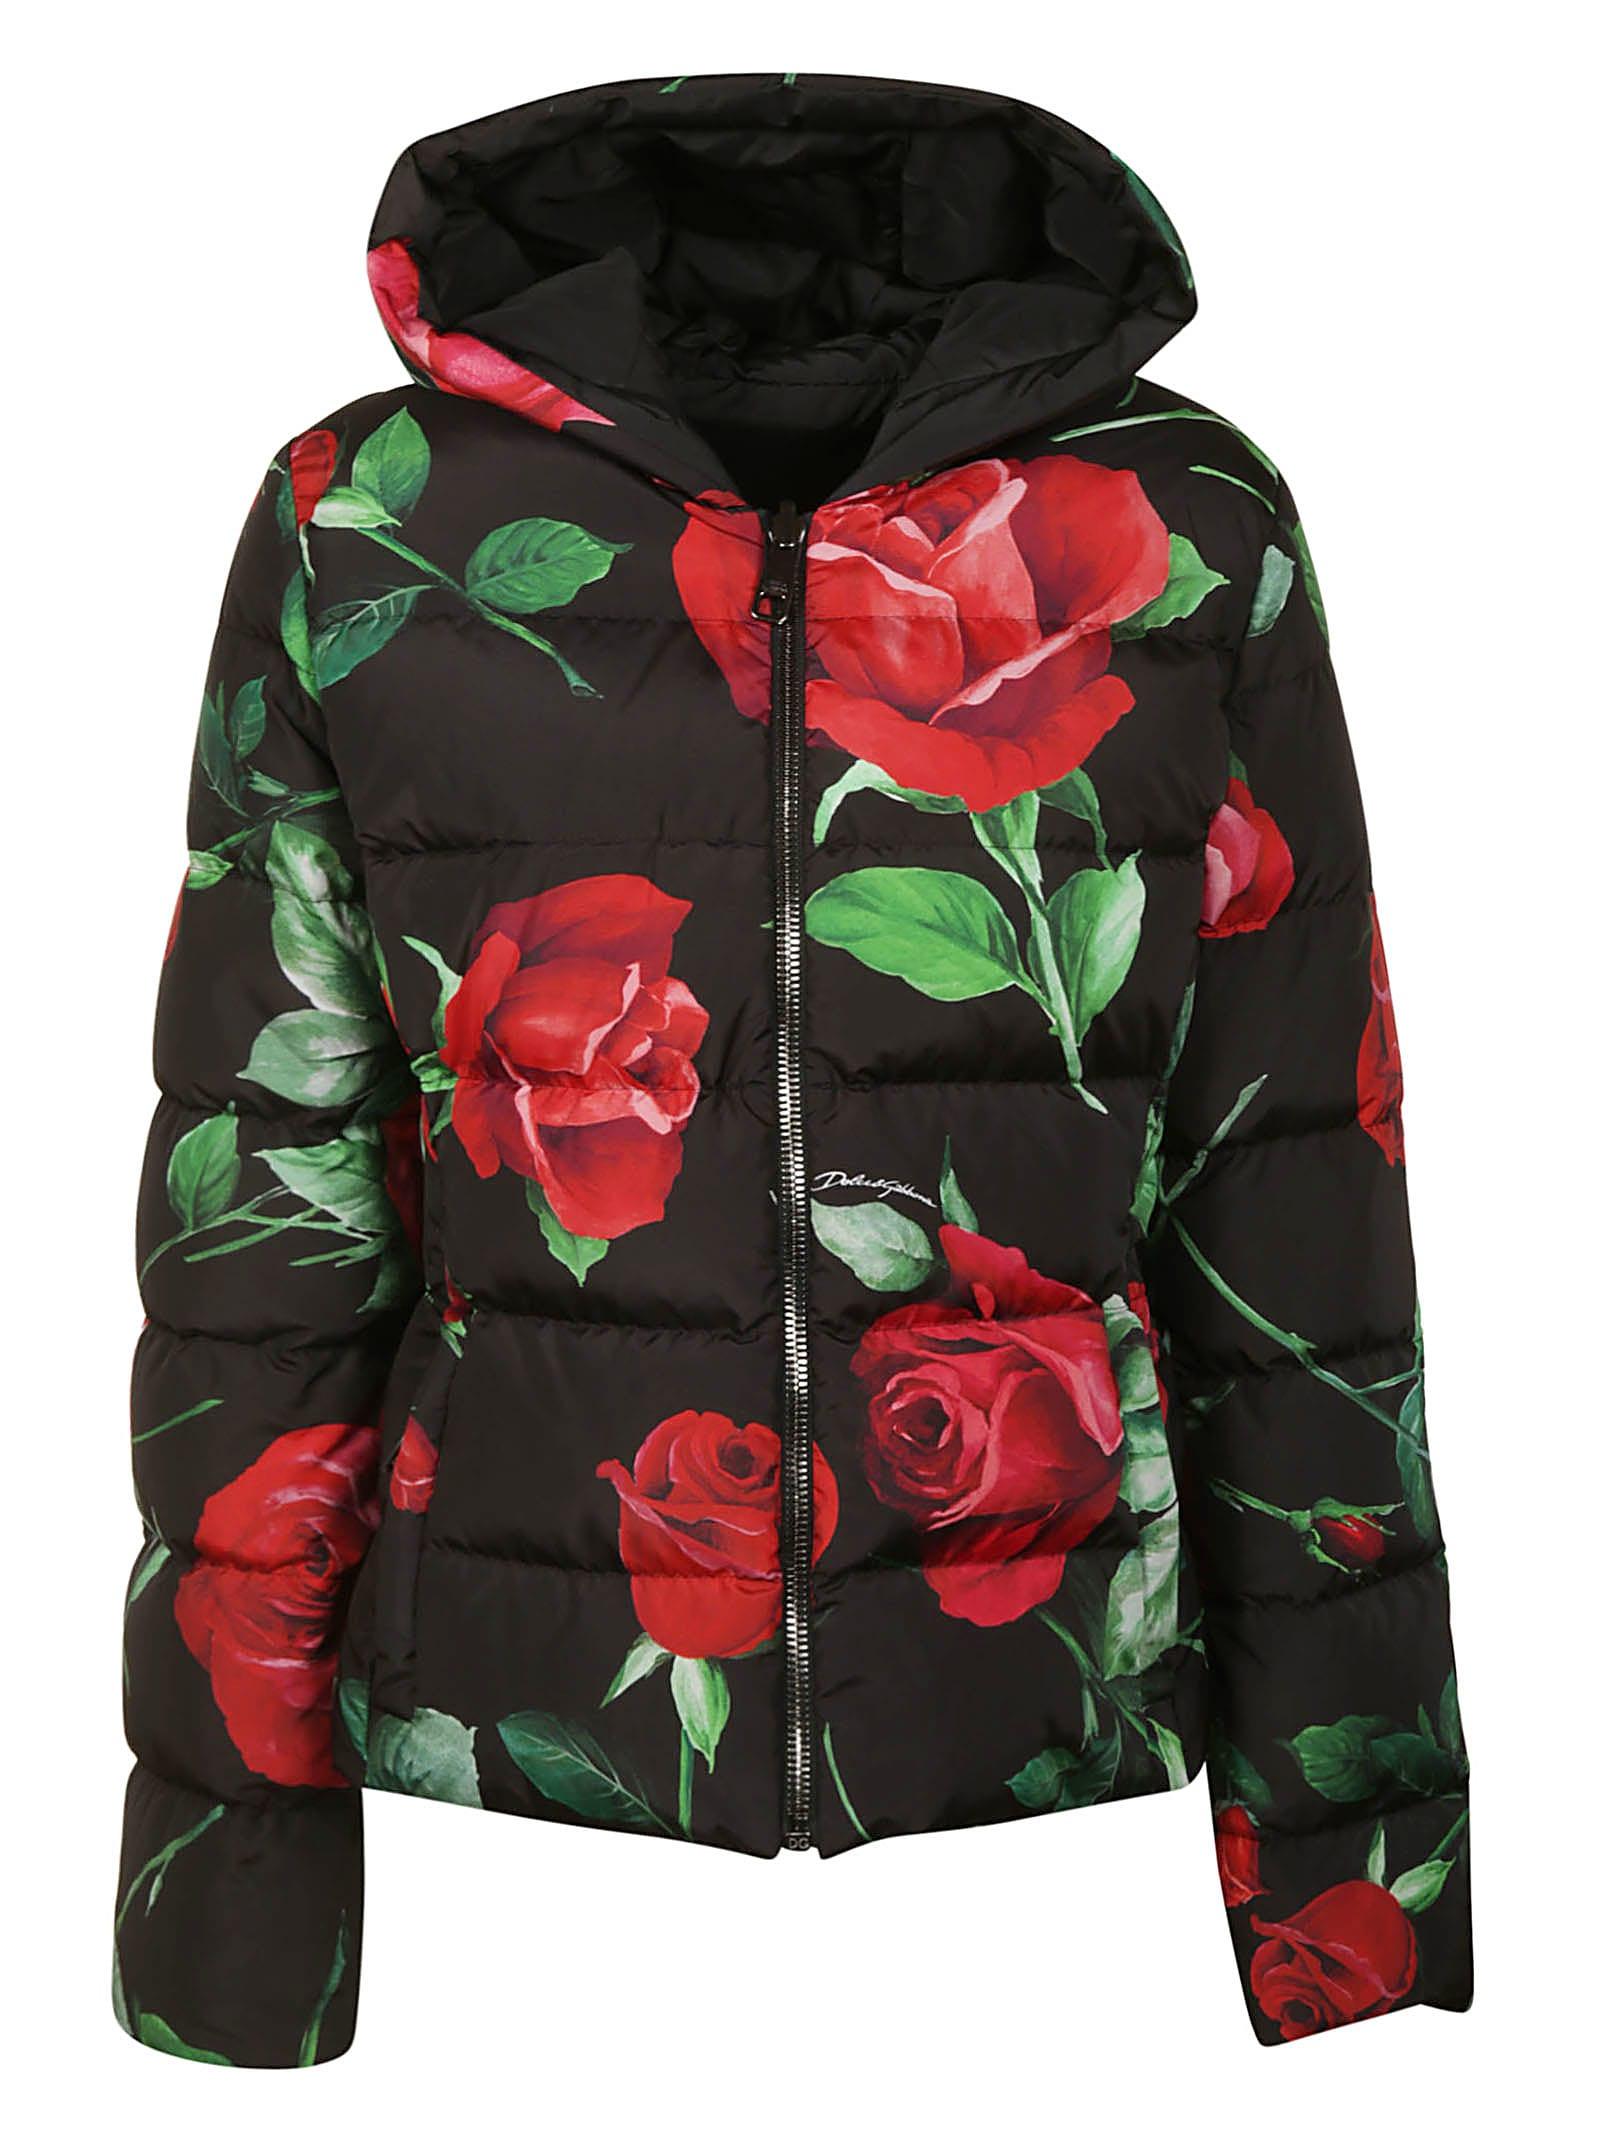 Dolce & Gabbana Rose Print Padded Jacket